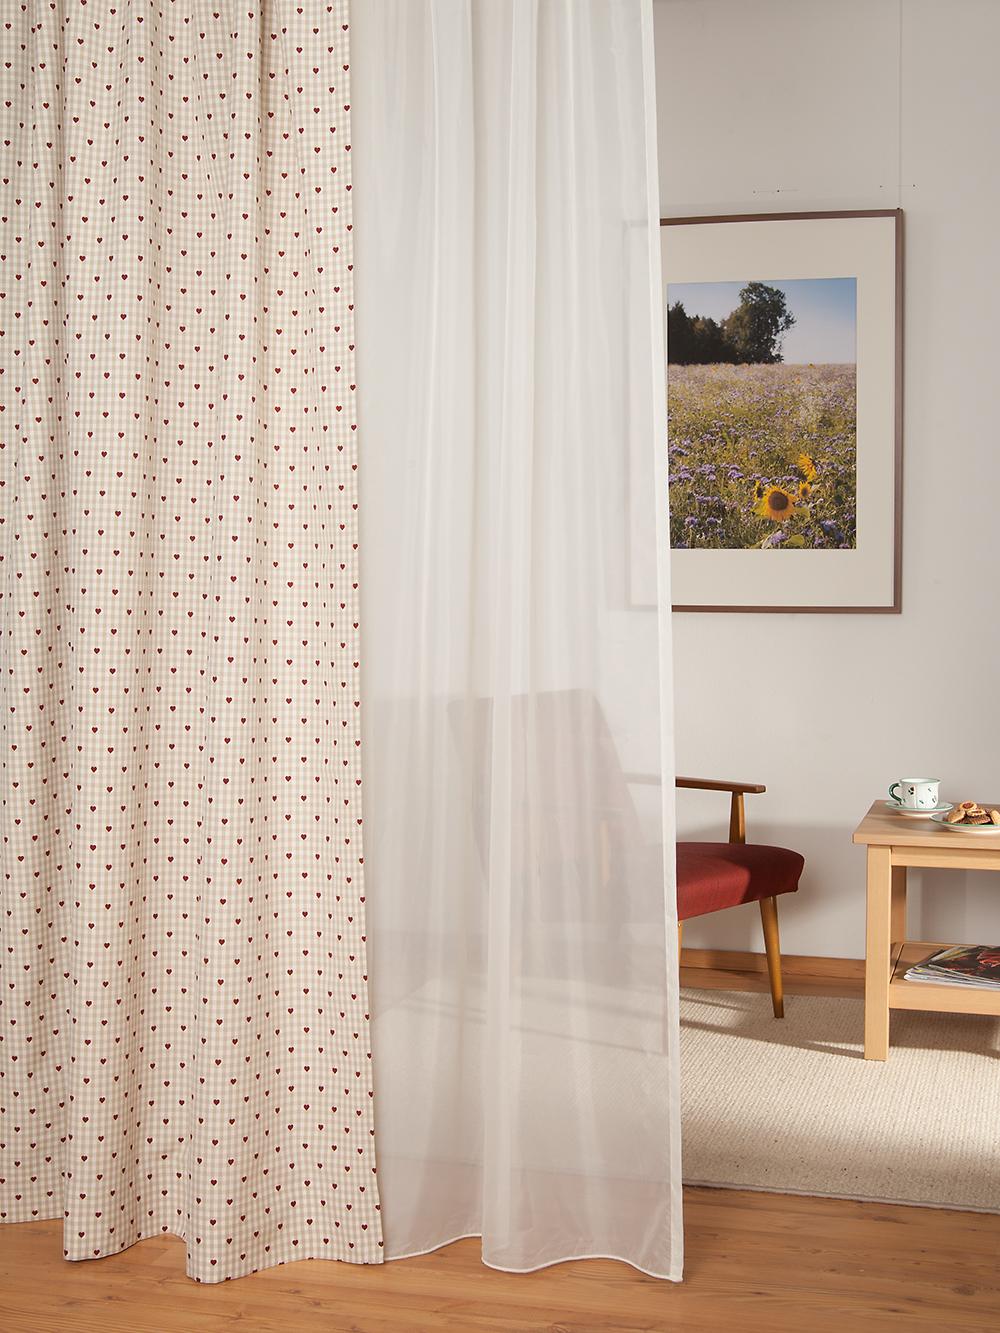 herzilein dekorstoff. Black Bedroom Furniture Sets. Home Design Ideas